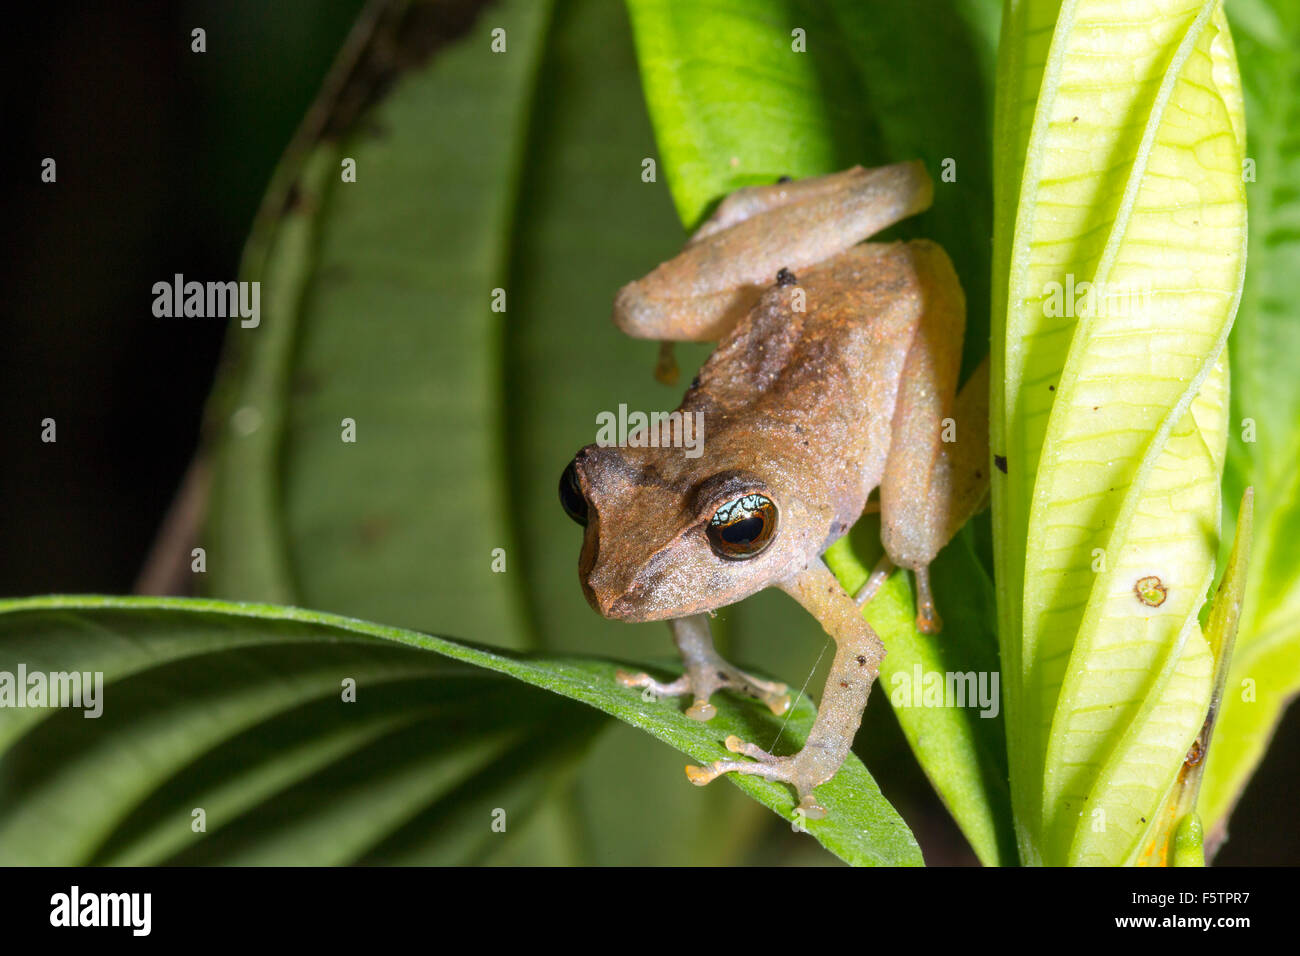 Male rain frog (Pristimantis matidiktyo) in calling position in the rainforest understory in Ecuador - Stock Image